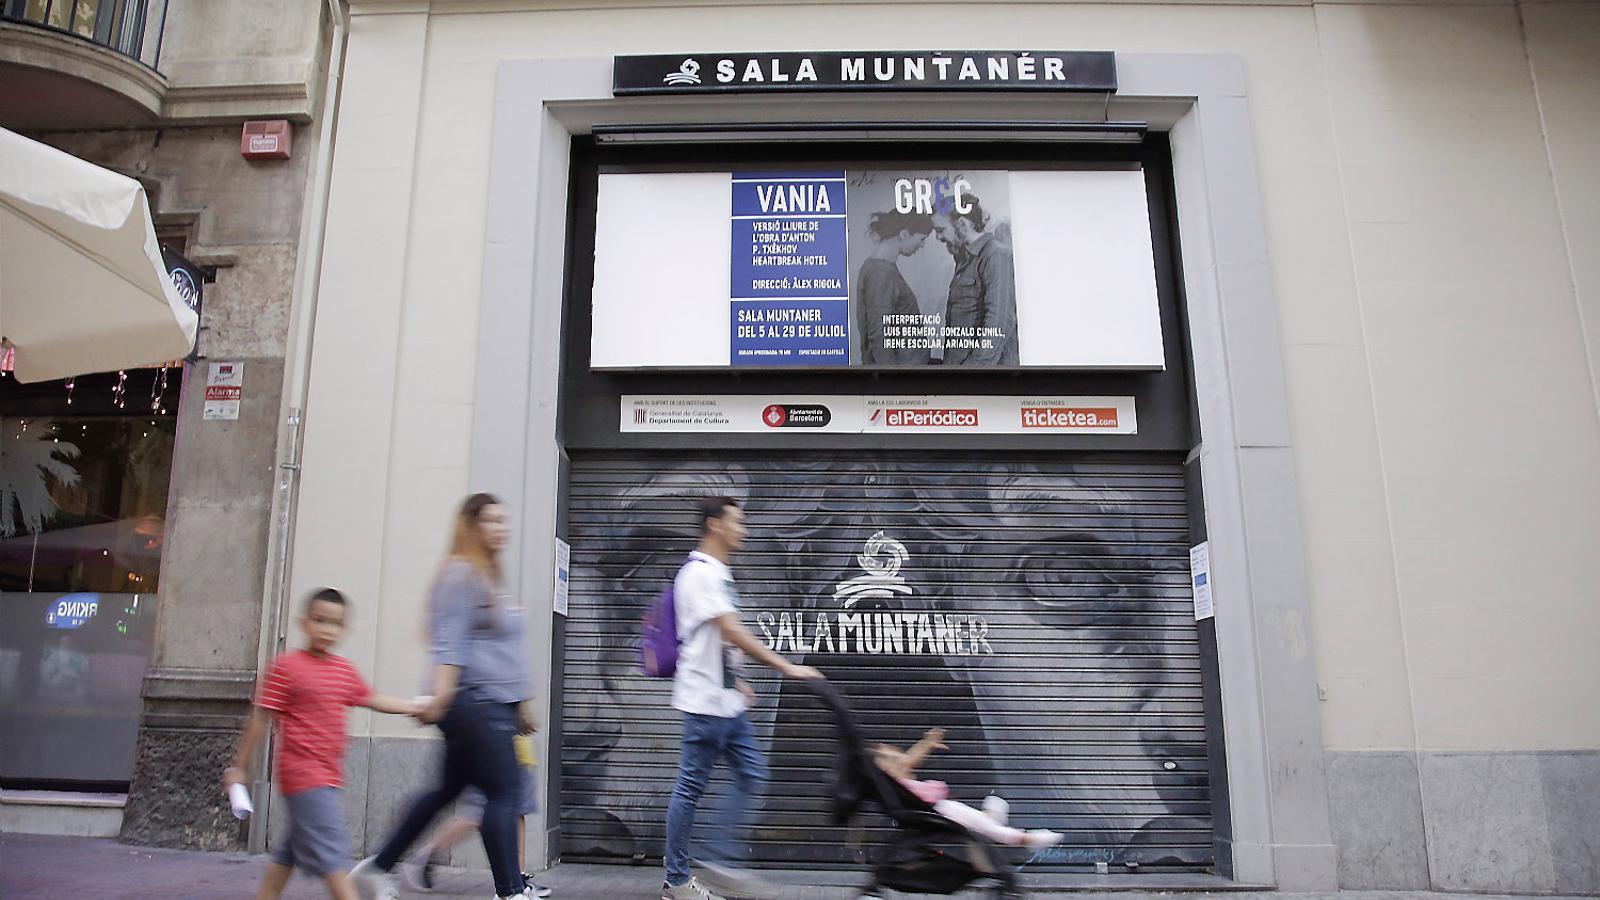 Tanca la sala muntaner for Sala muntaner barcelona